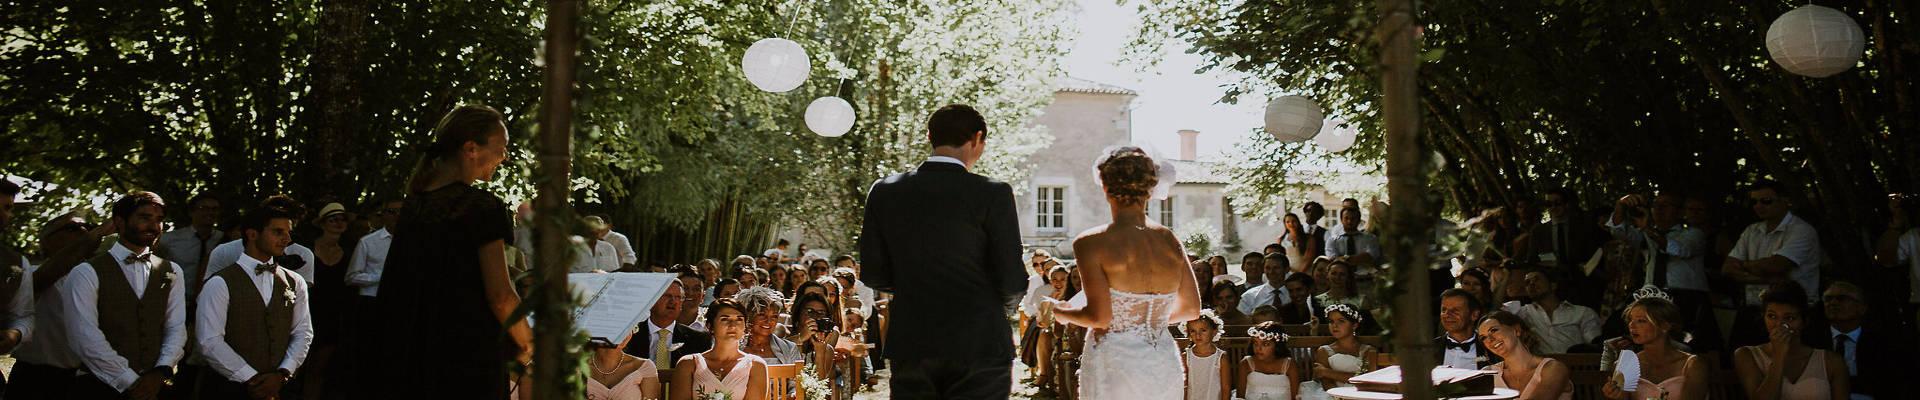 unique ceremonies france - french wedding celebrant spoken english